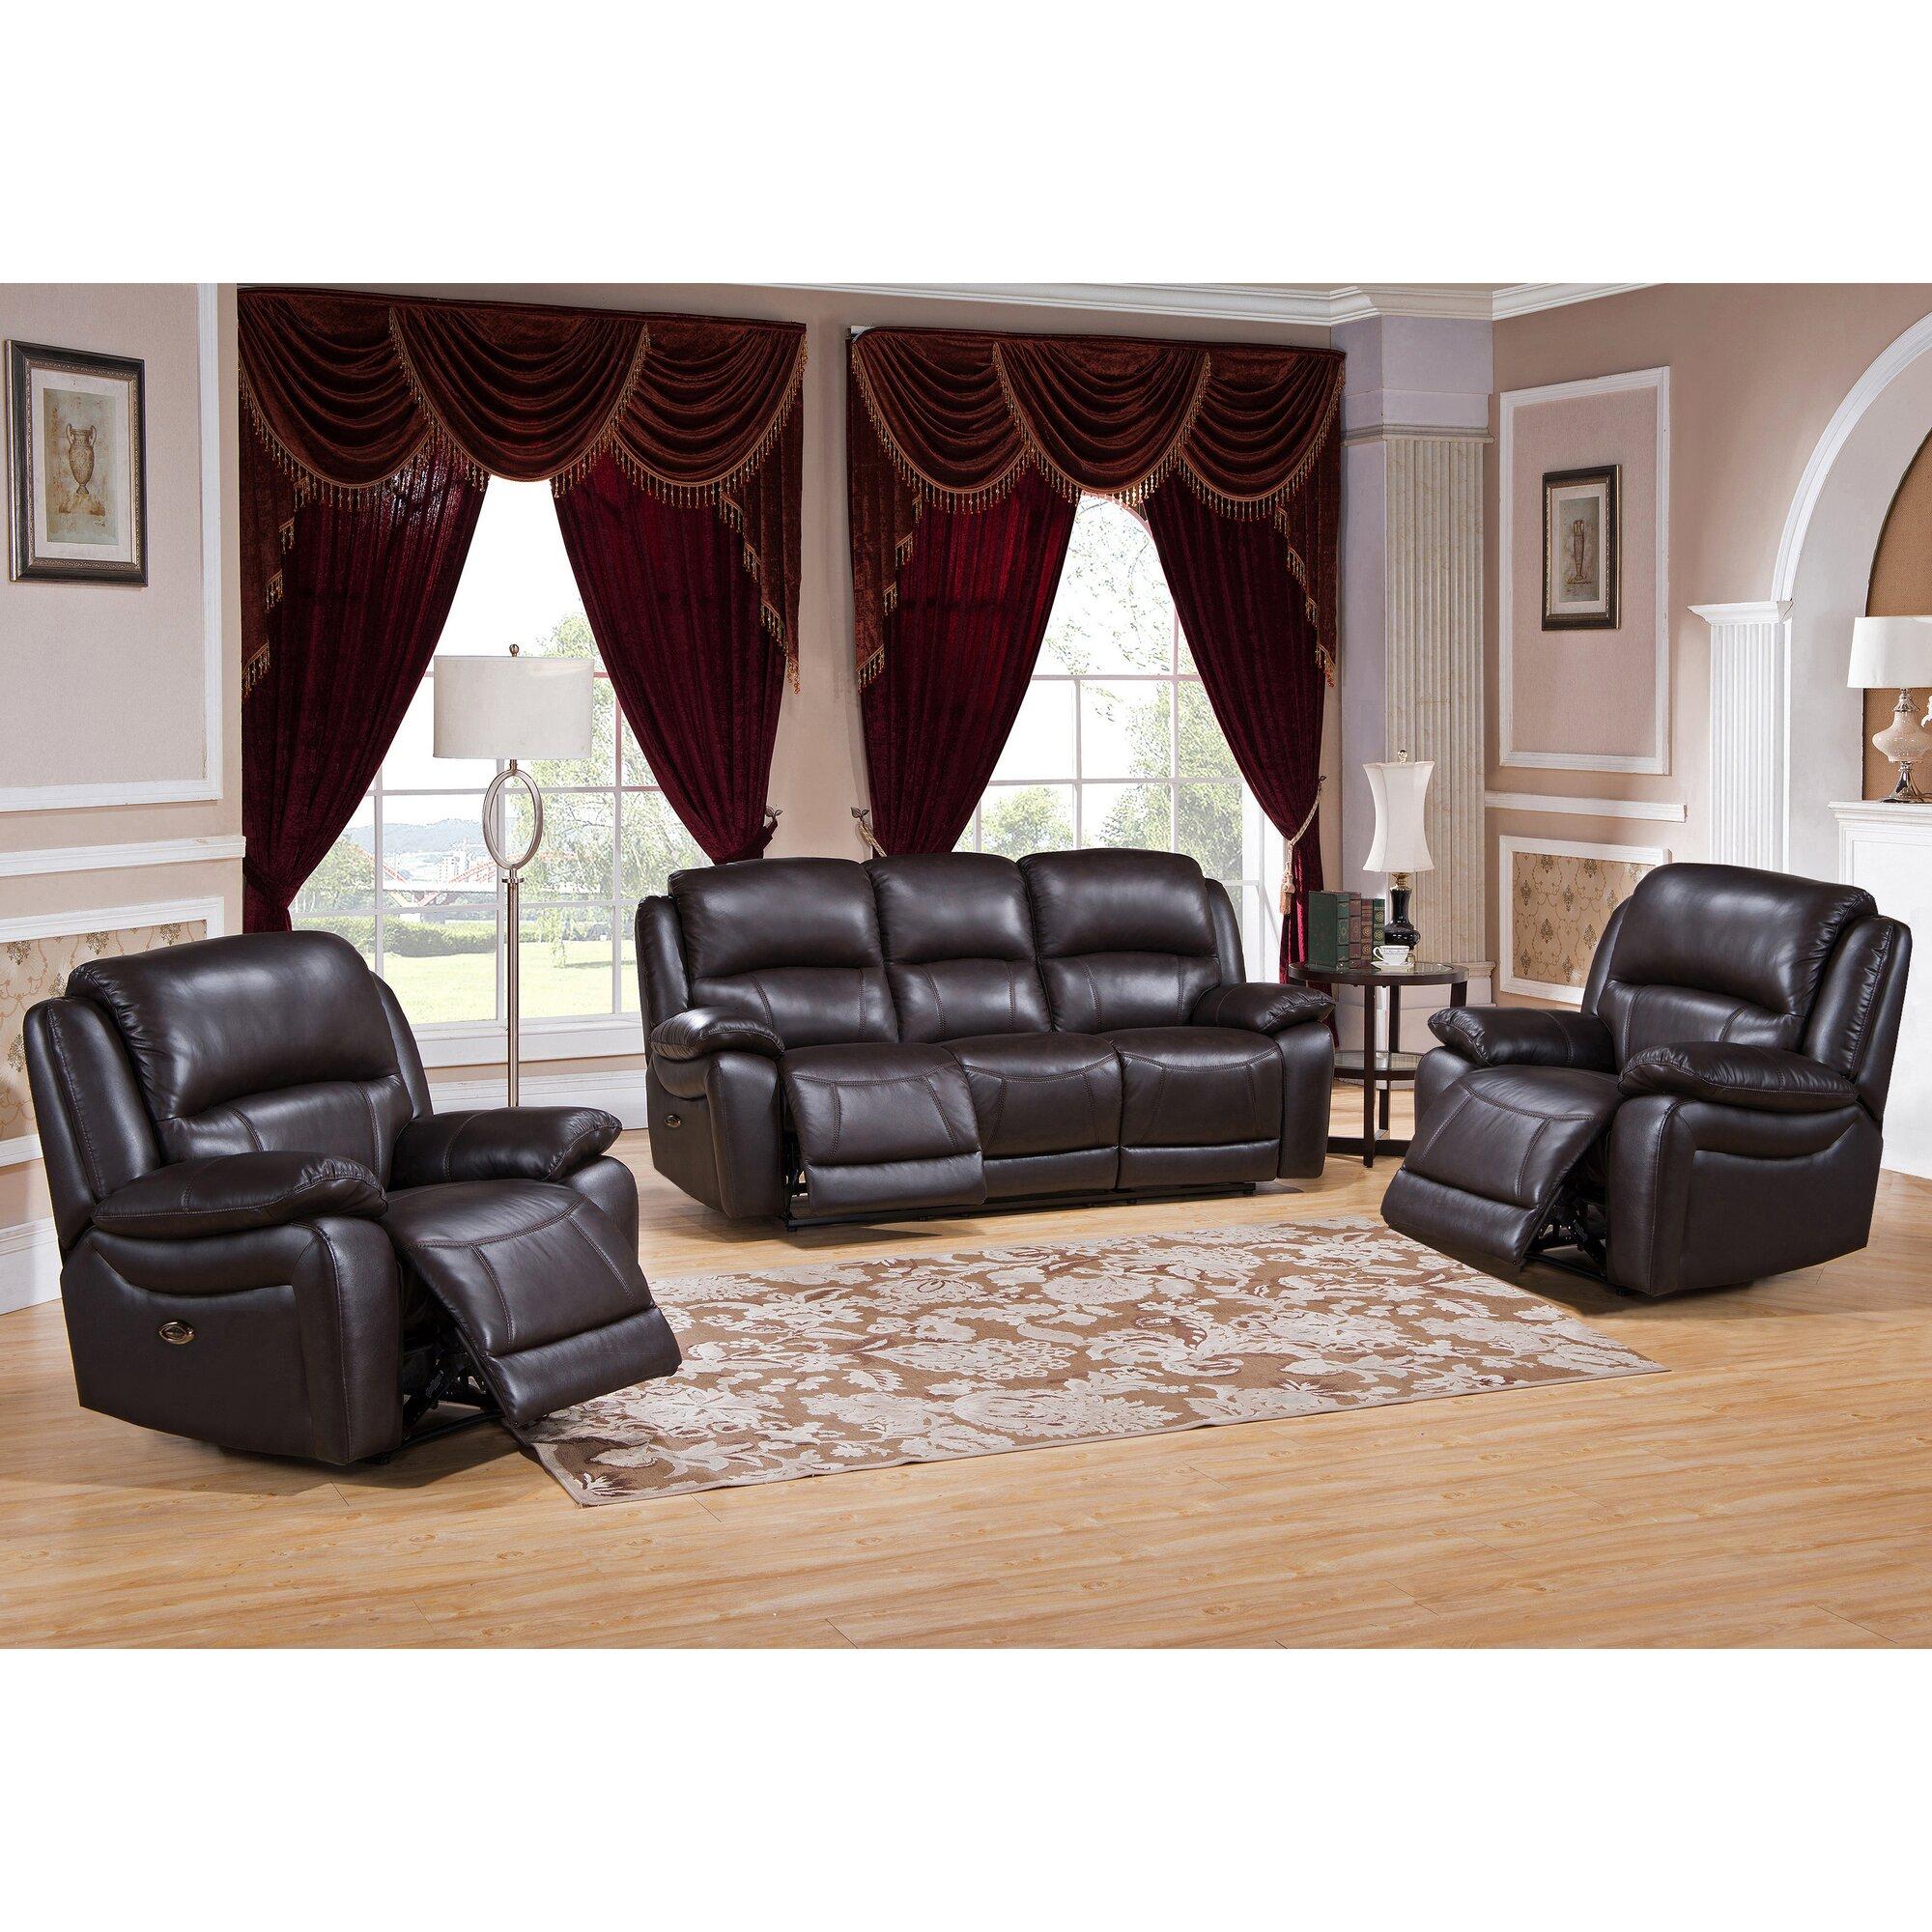 Hydelinebyamax kingston 3 piece leather living room set for Three piece leather living room set